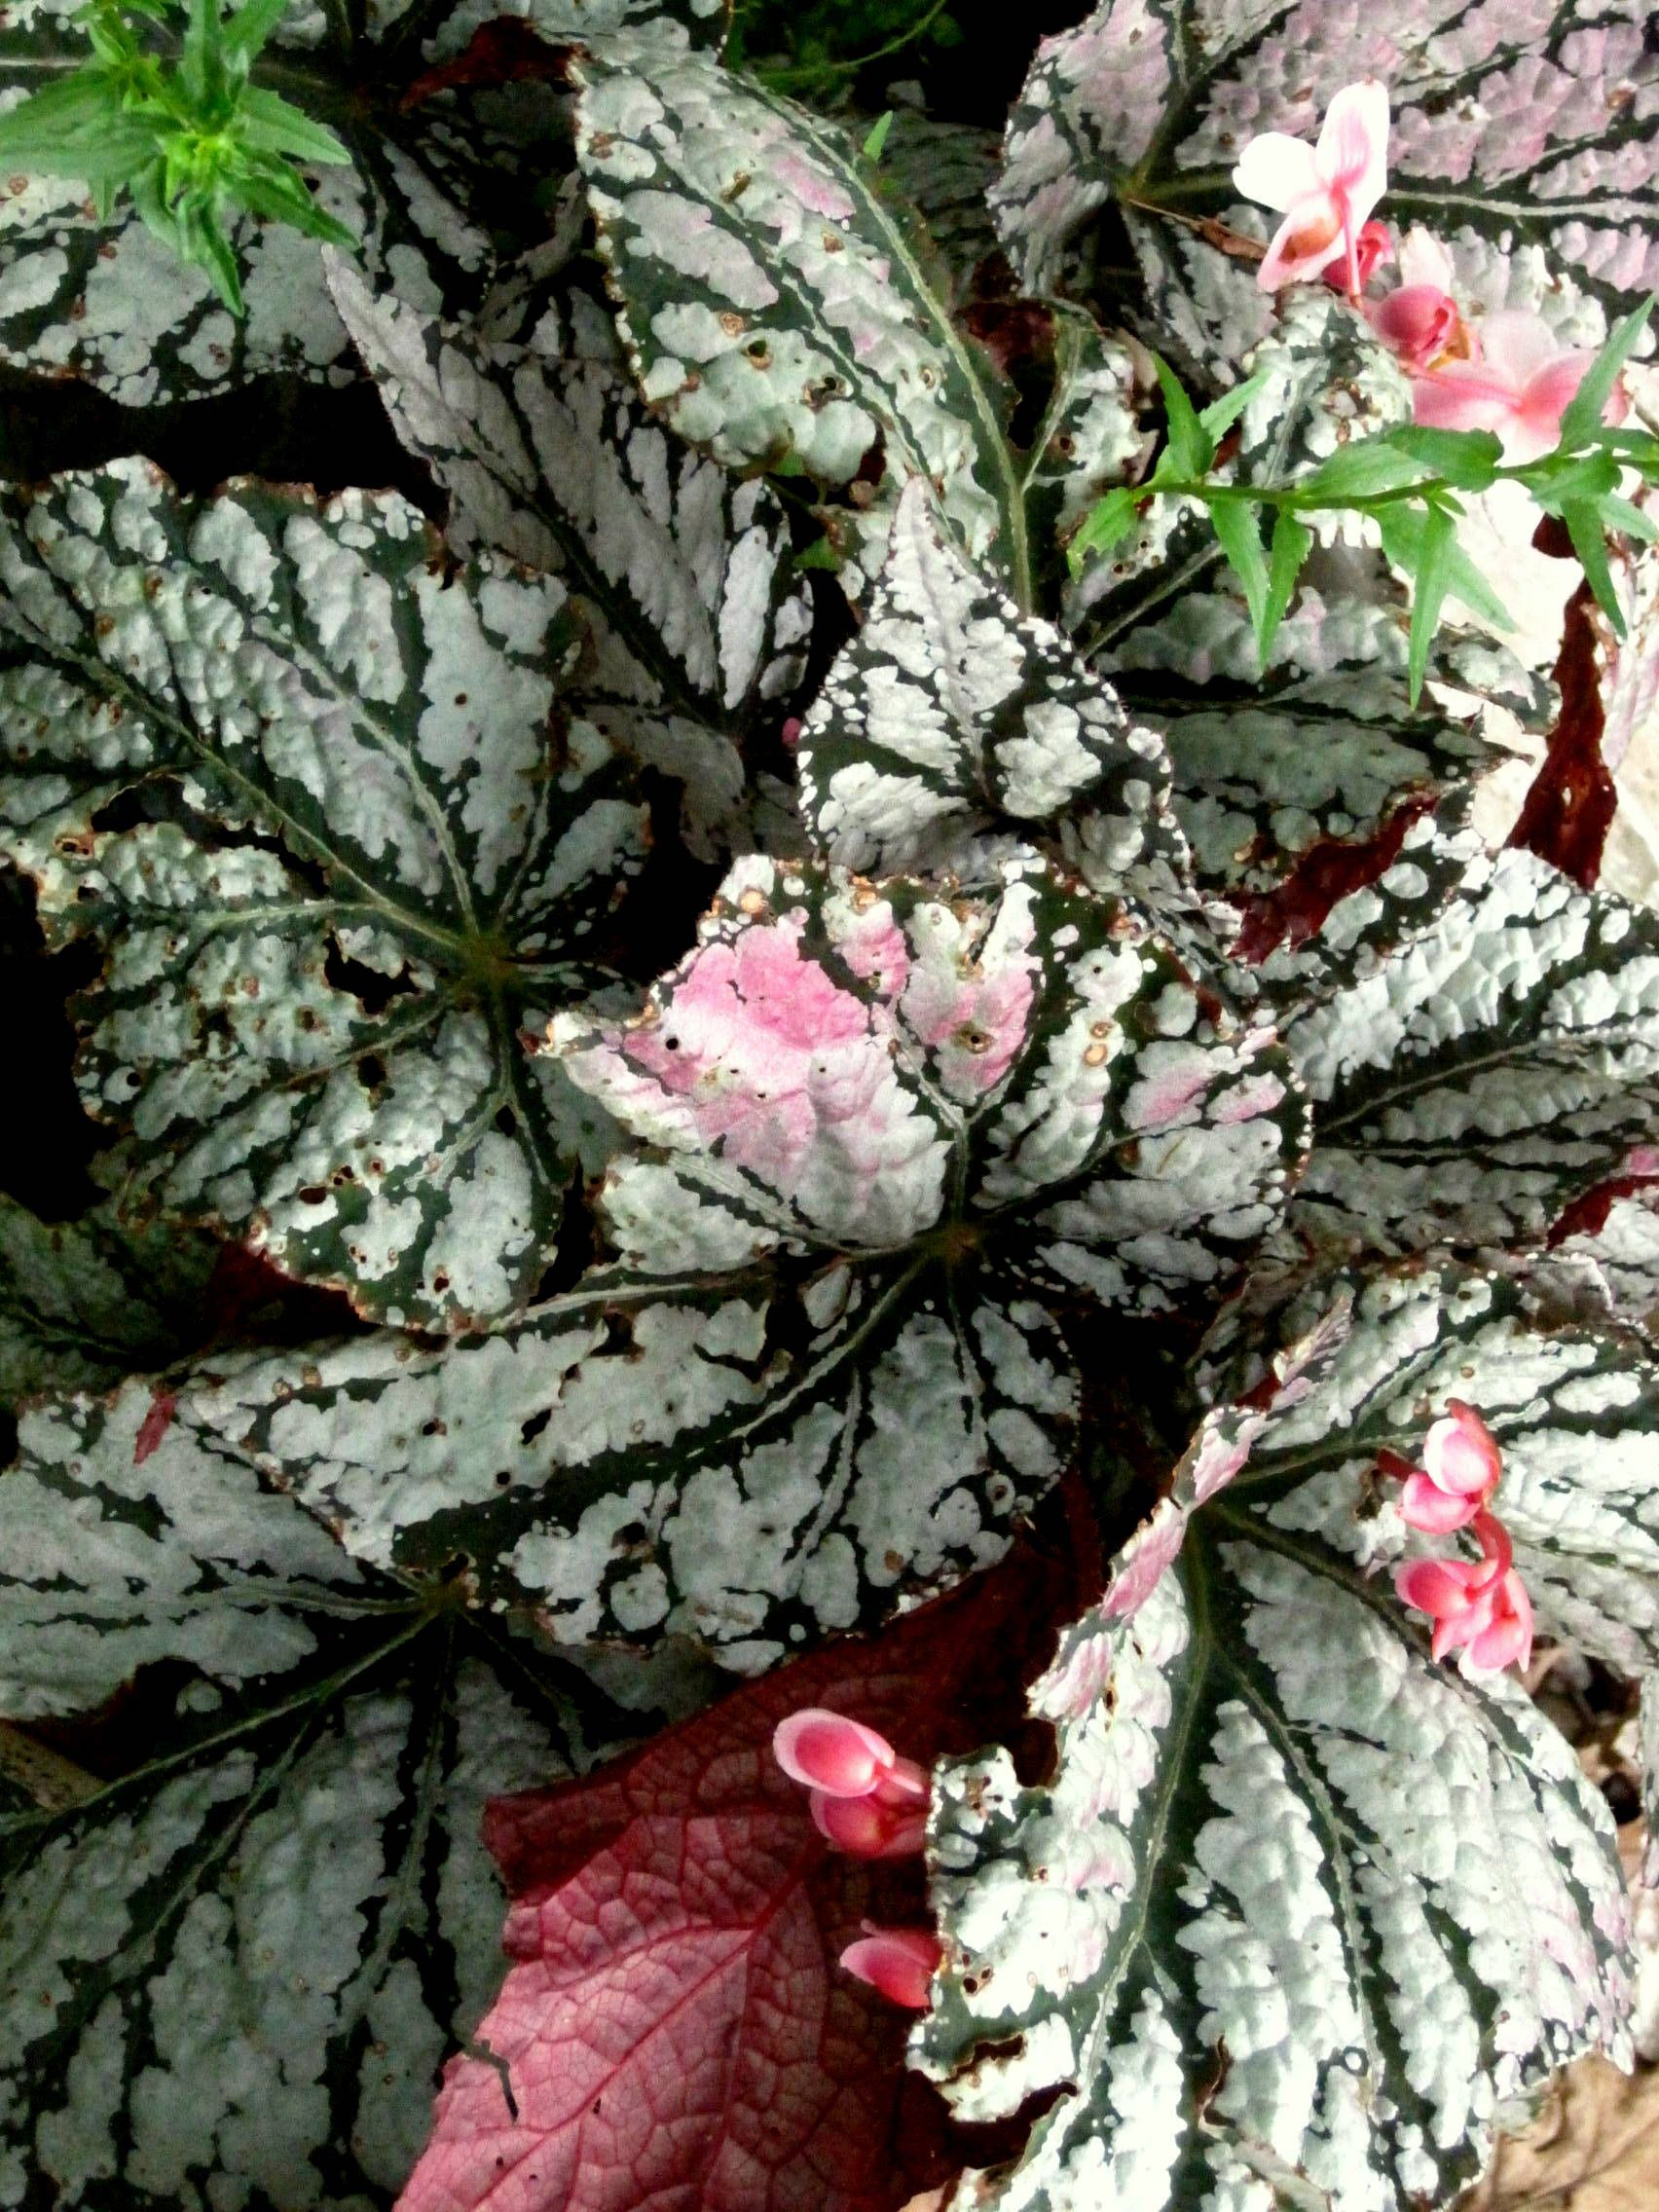 Begonia Begonia Perennial Flowering Plants Foliage Plants